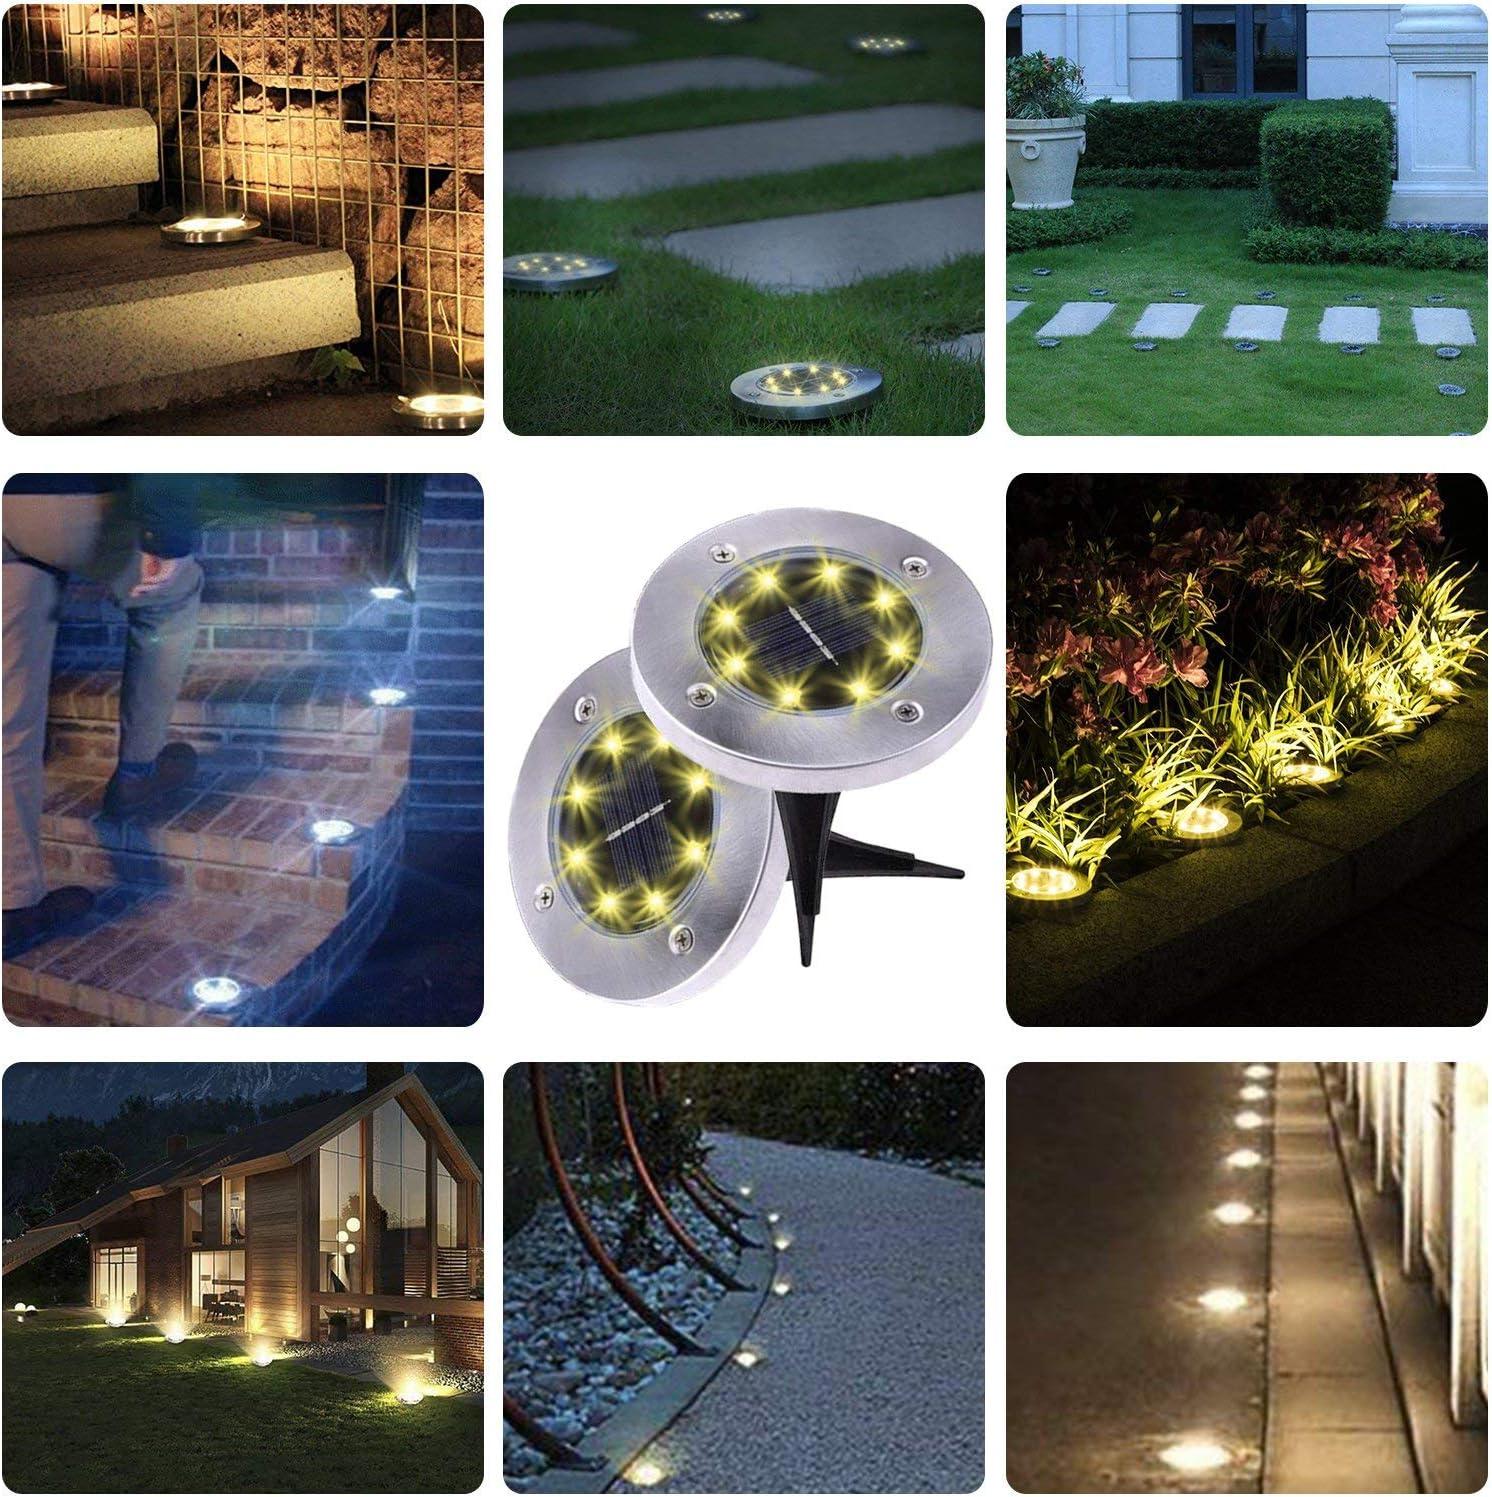 Solar Ground Lights - 8 Led Solar Garden Lights Outdoor,disk Lights Waterproof In-ground Outdoor Landscape Lighting For Lawn Patio Pathway Yard Deck Walkway Flood Light  Garden & Outdoor